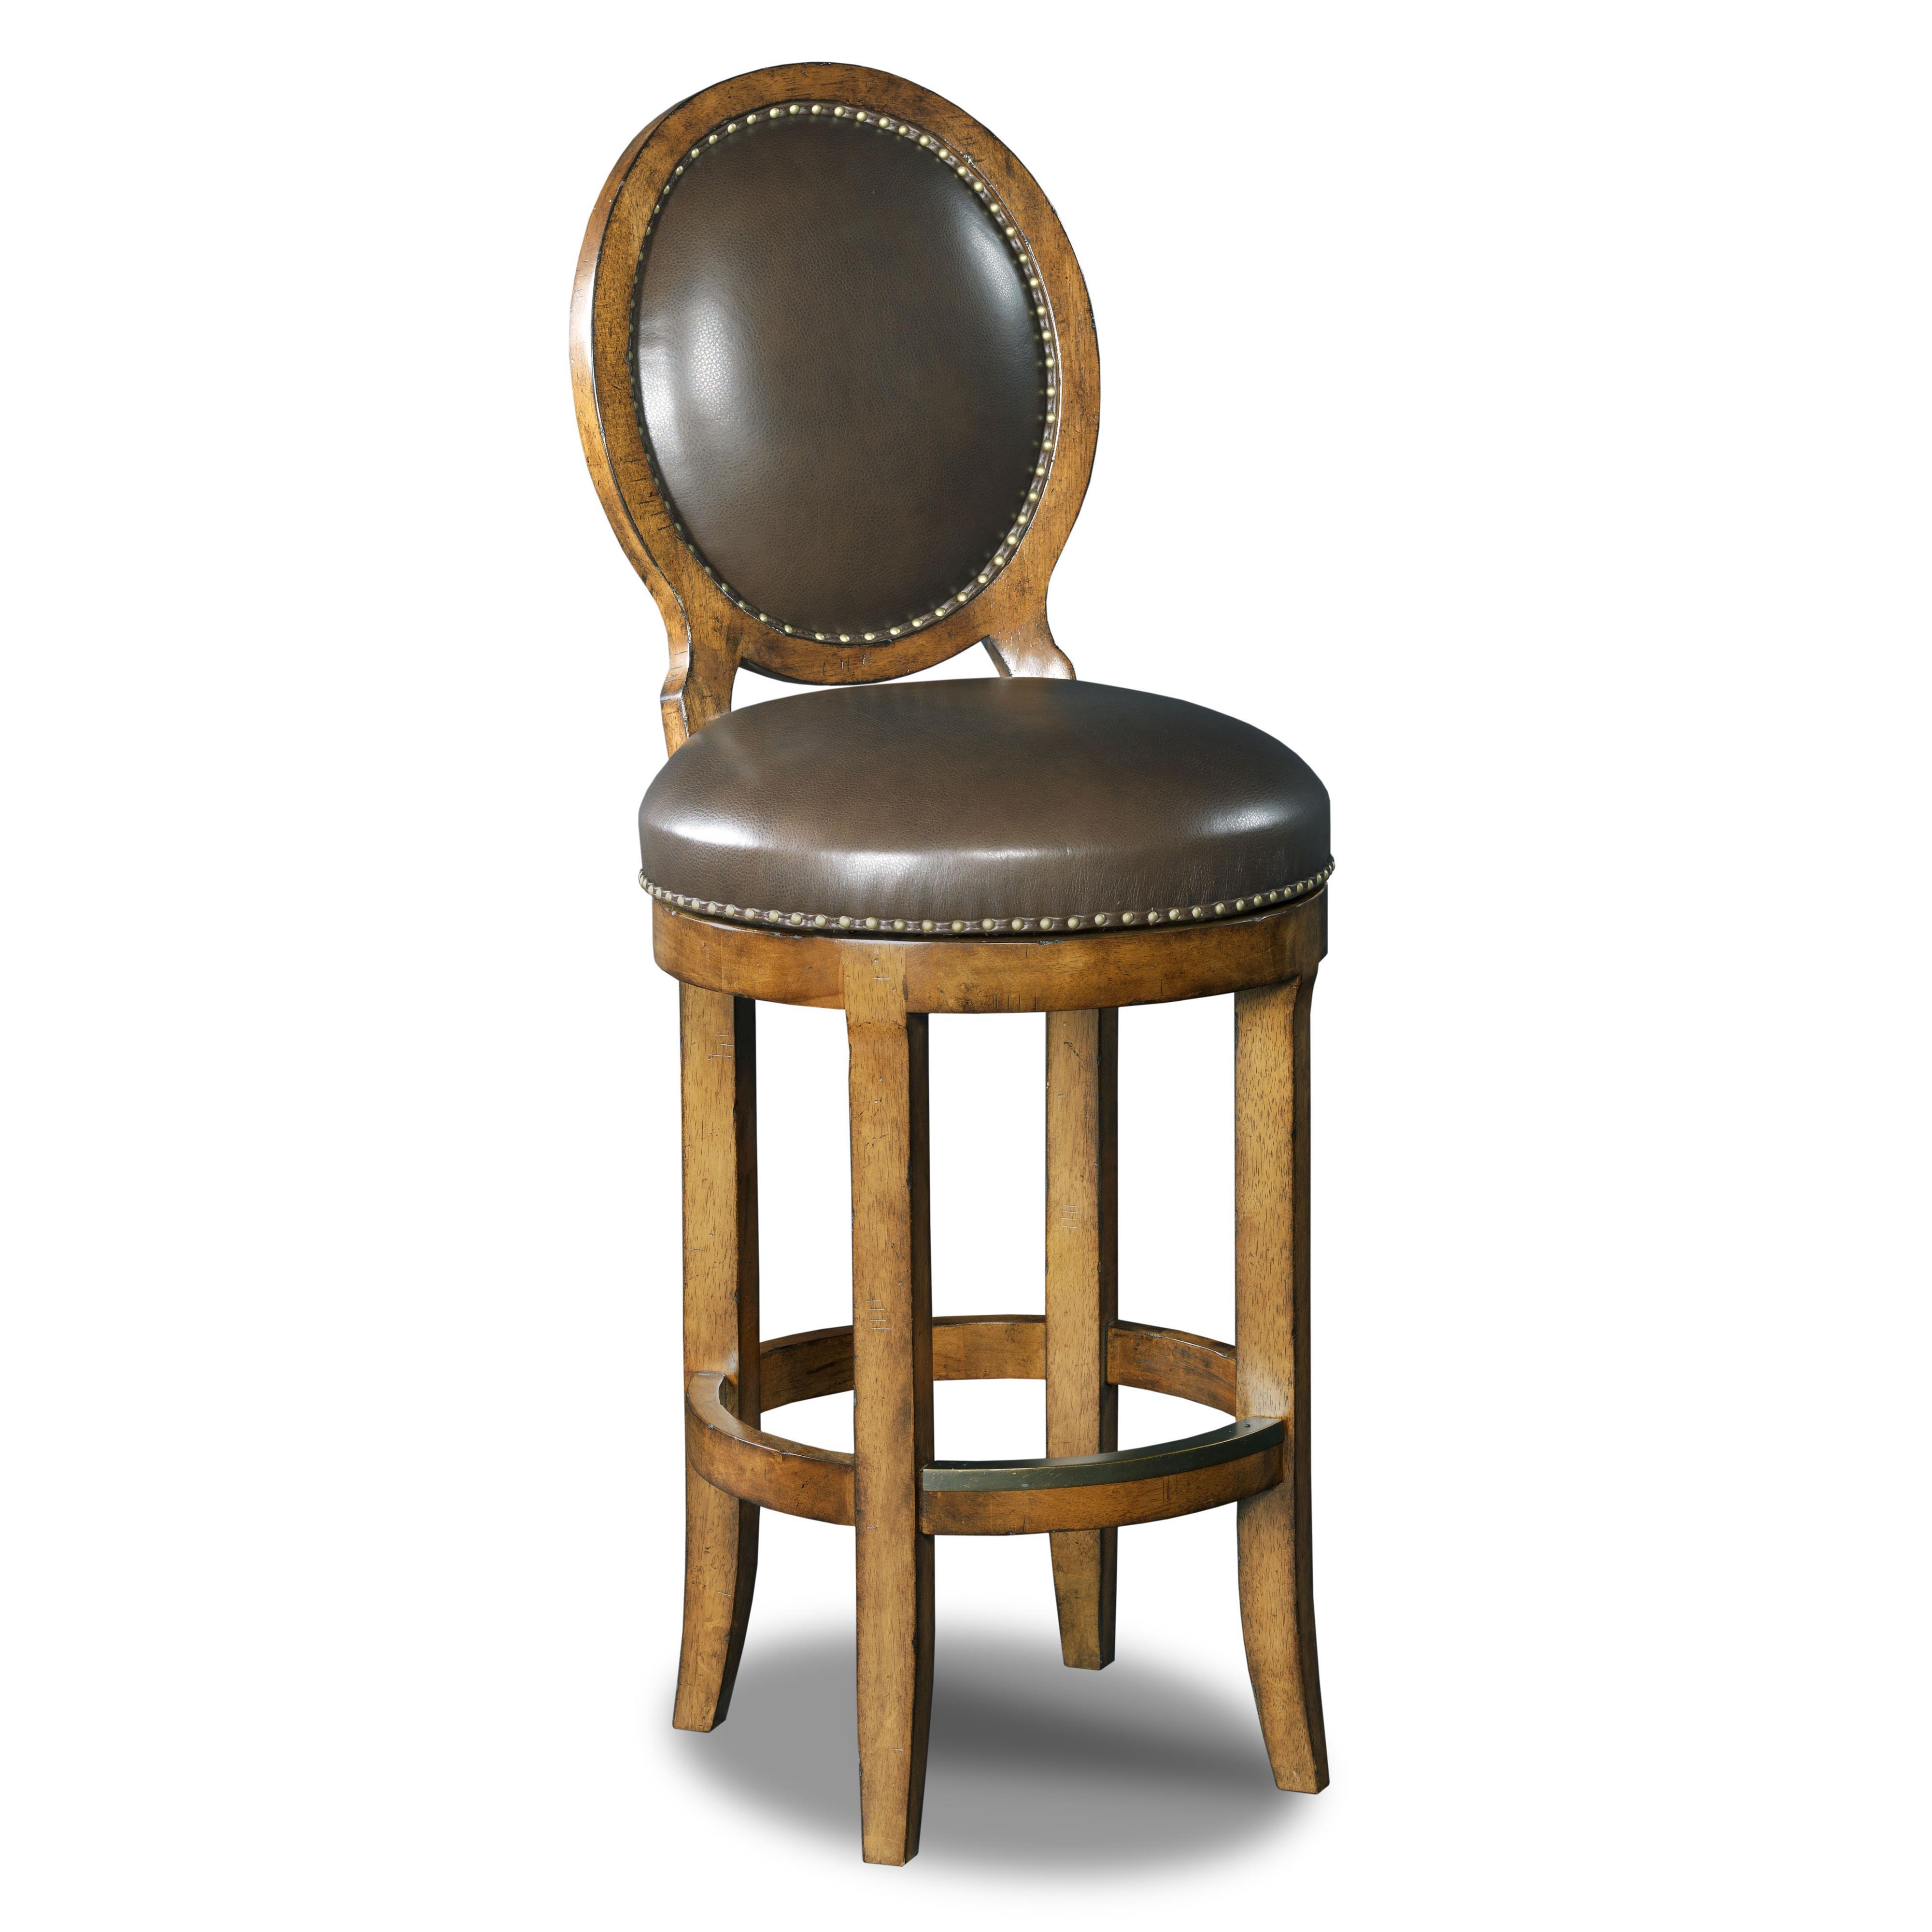 Hooker Furniture Stools Medium Mojito Oval Back Barstool